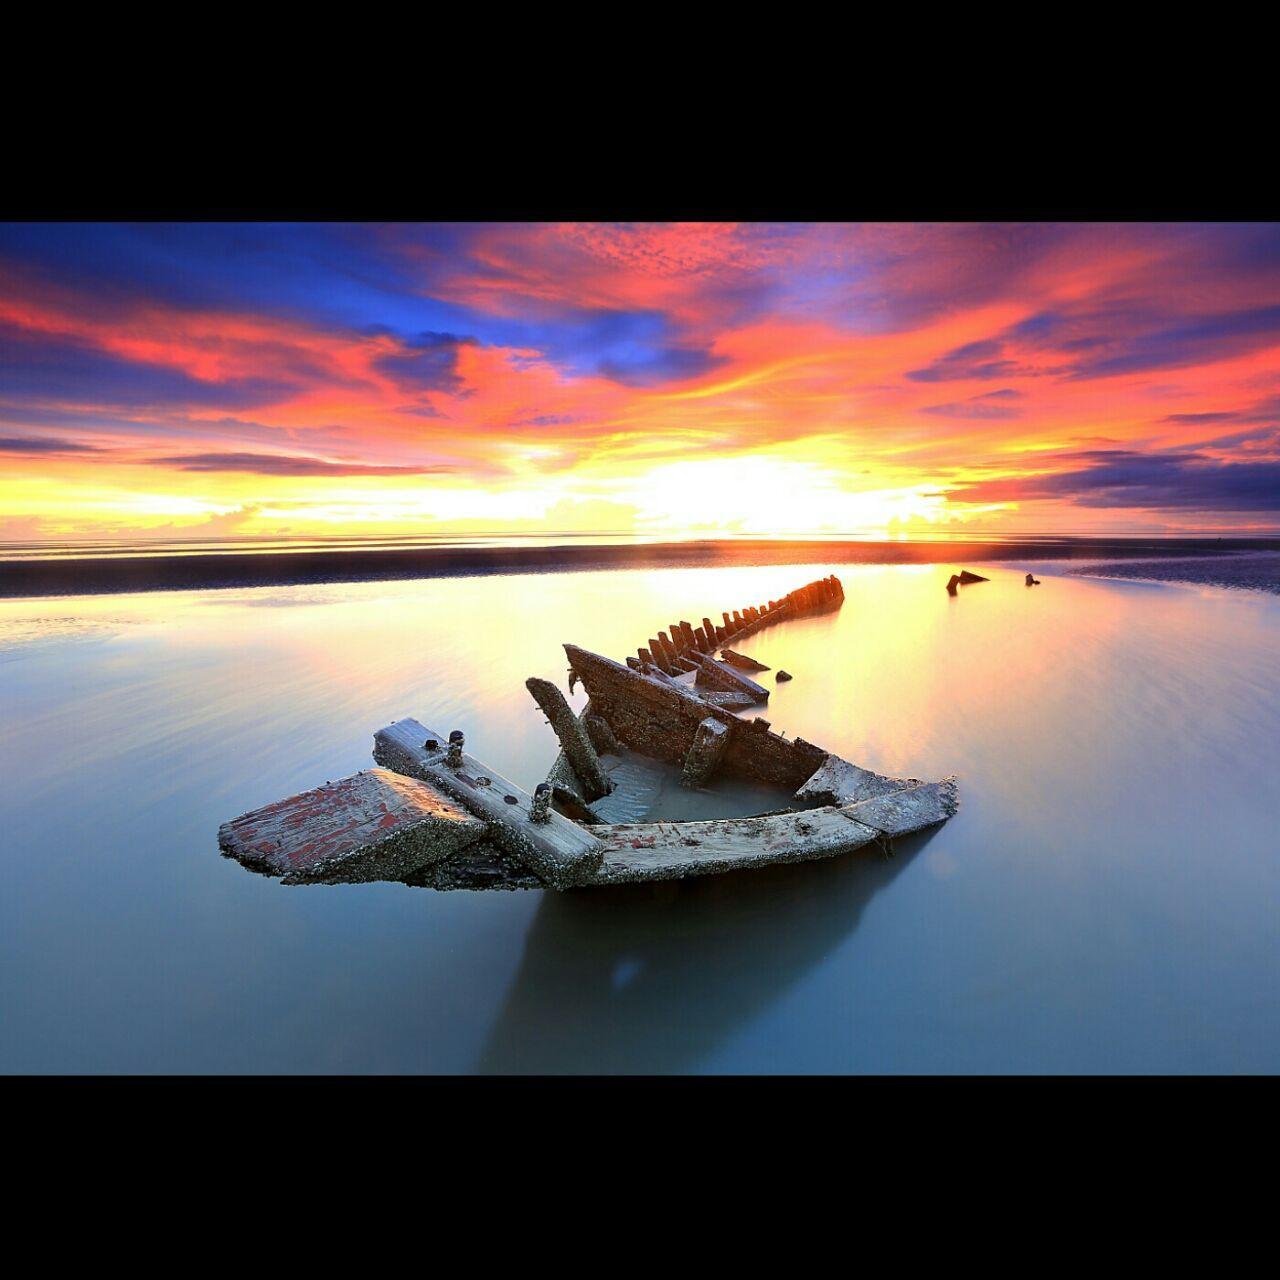 Suasana sunset Laut Arafura di Pantai Mbuti atau Pantai Lampu Satu Merauke. (Kabarpapua.co /Amran)